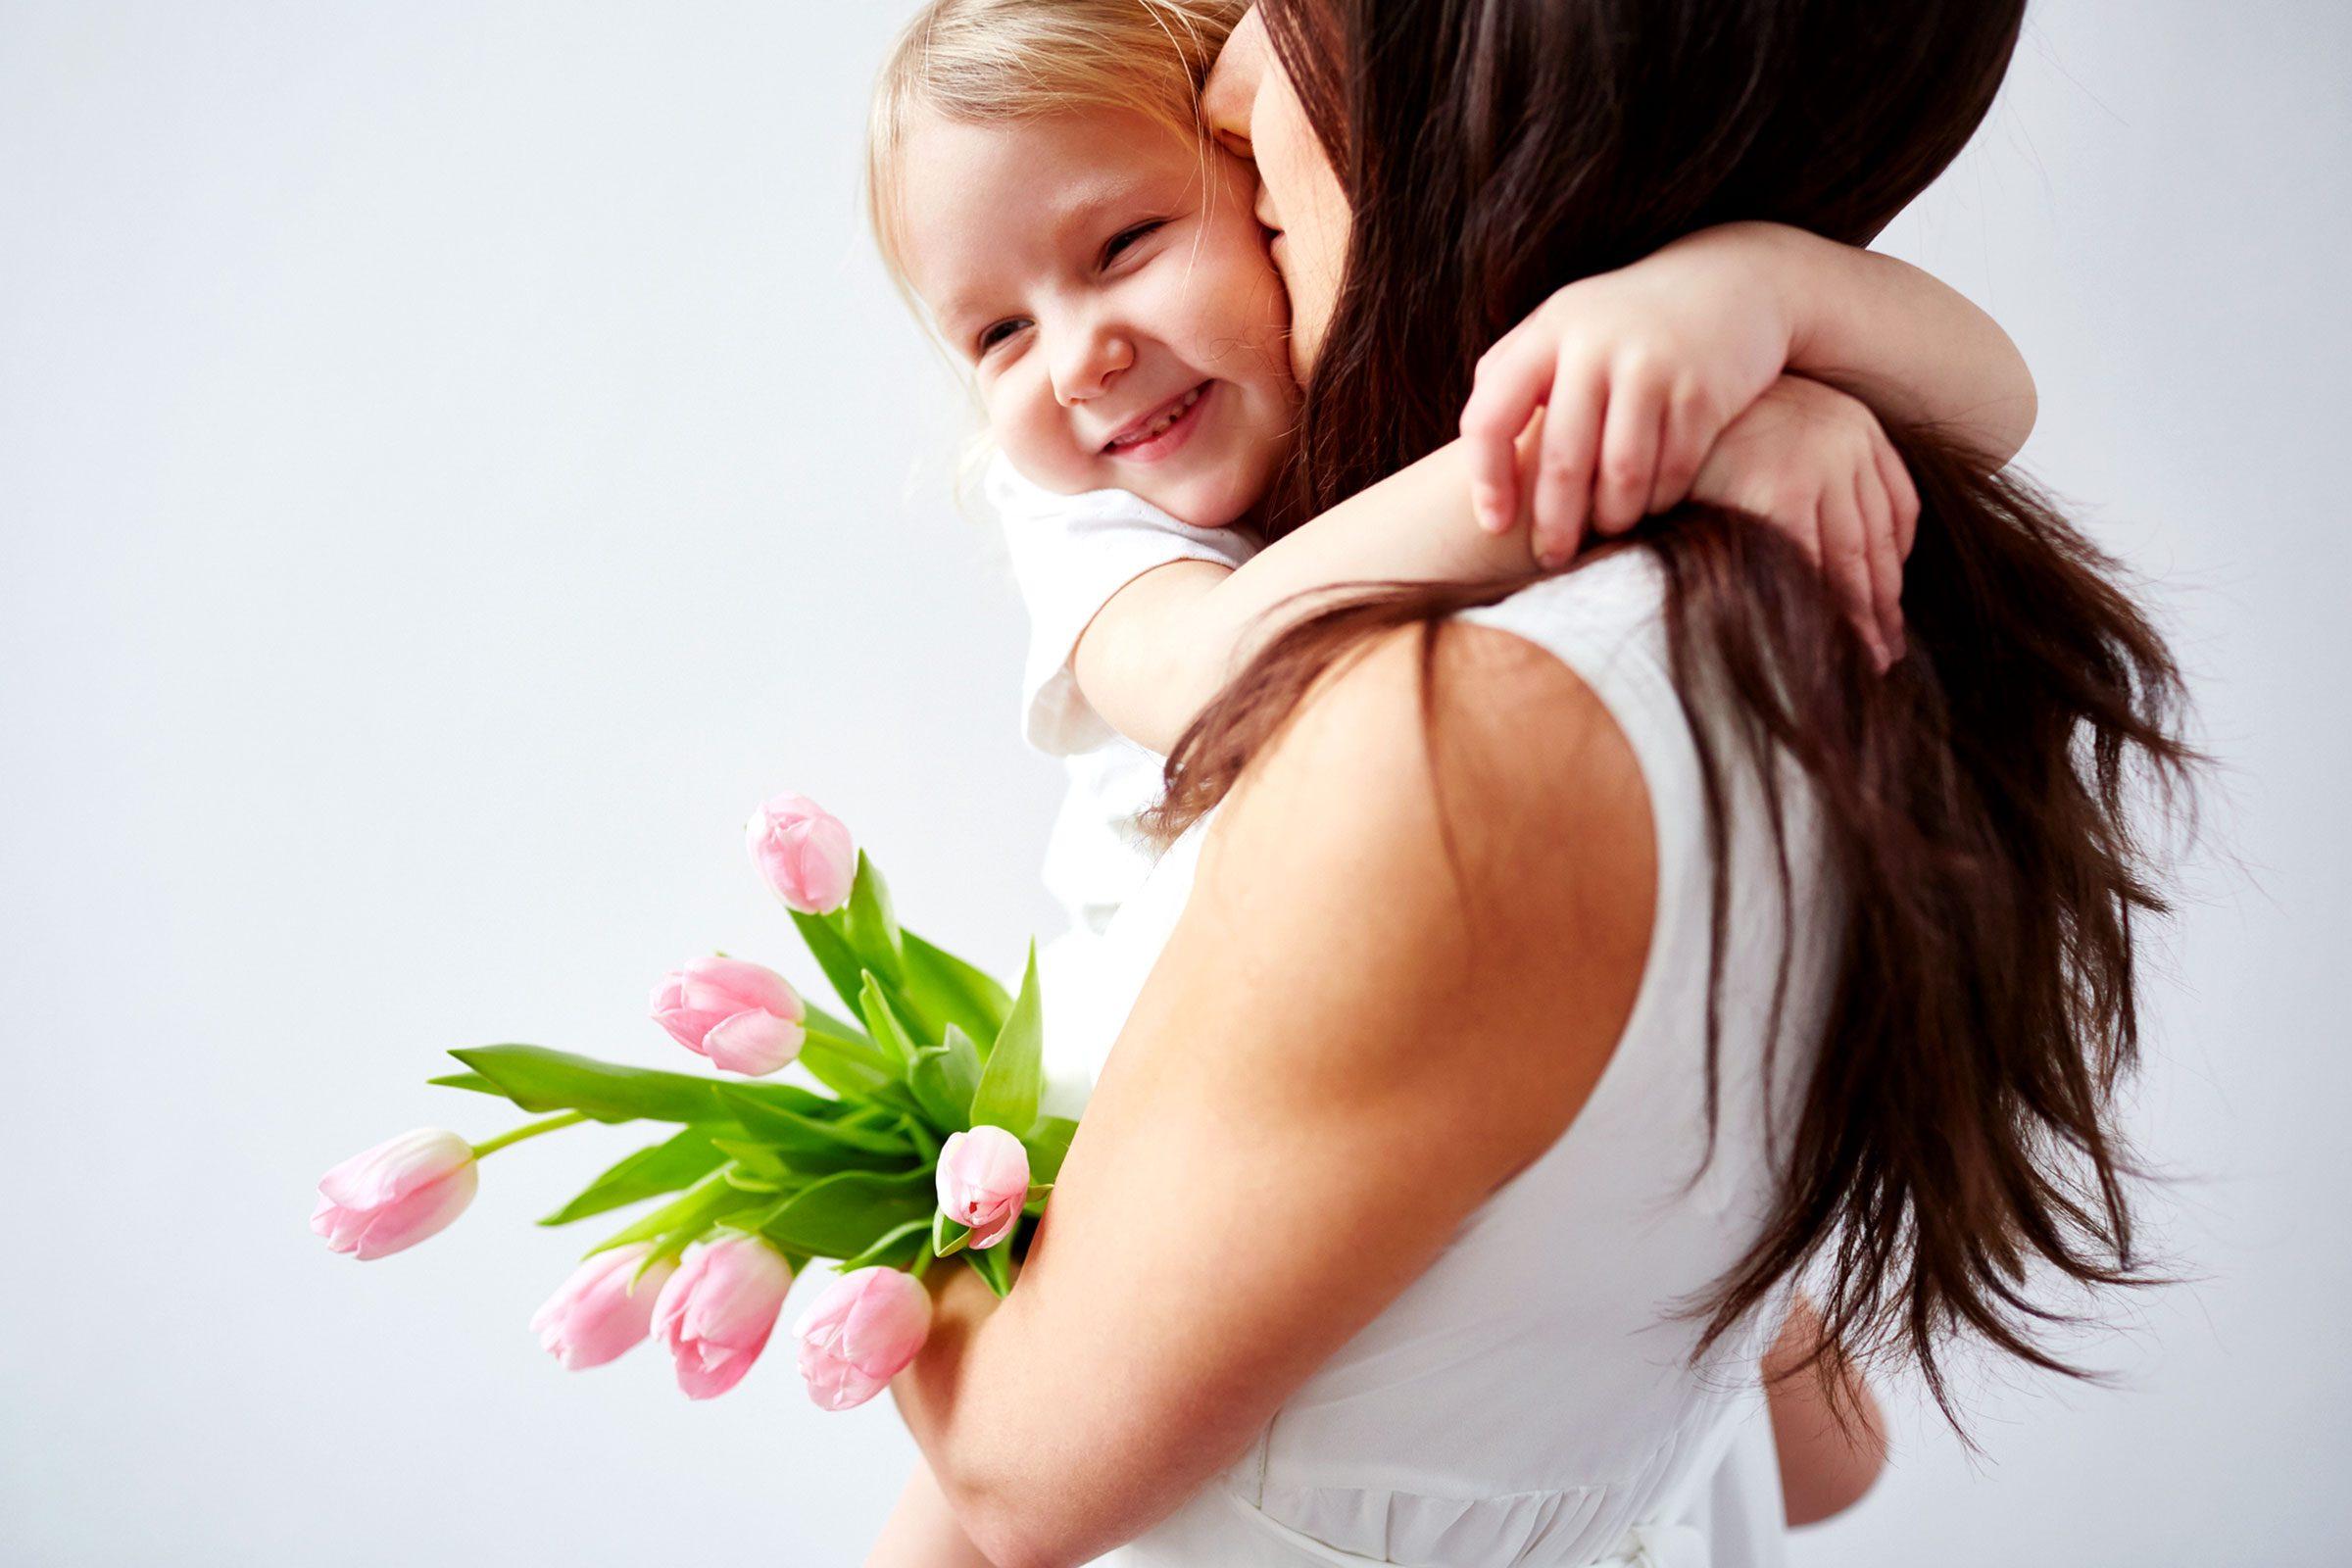 08-Valentine's-Day-Date-Ideas-That-Don't-Require-A-Babysitter